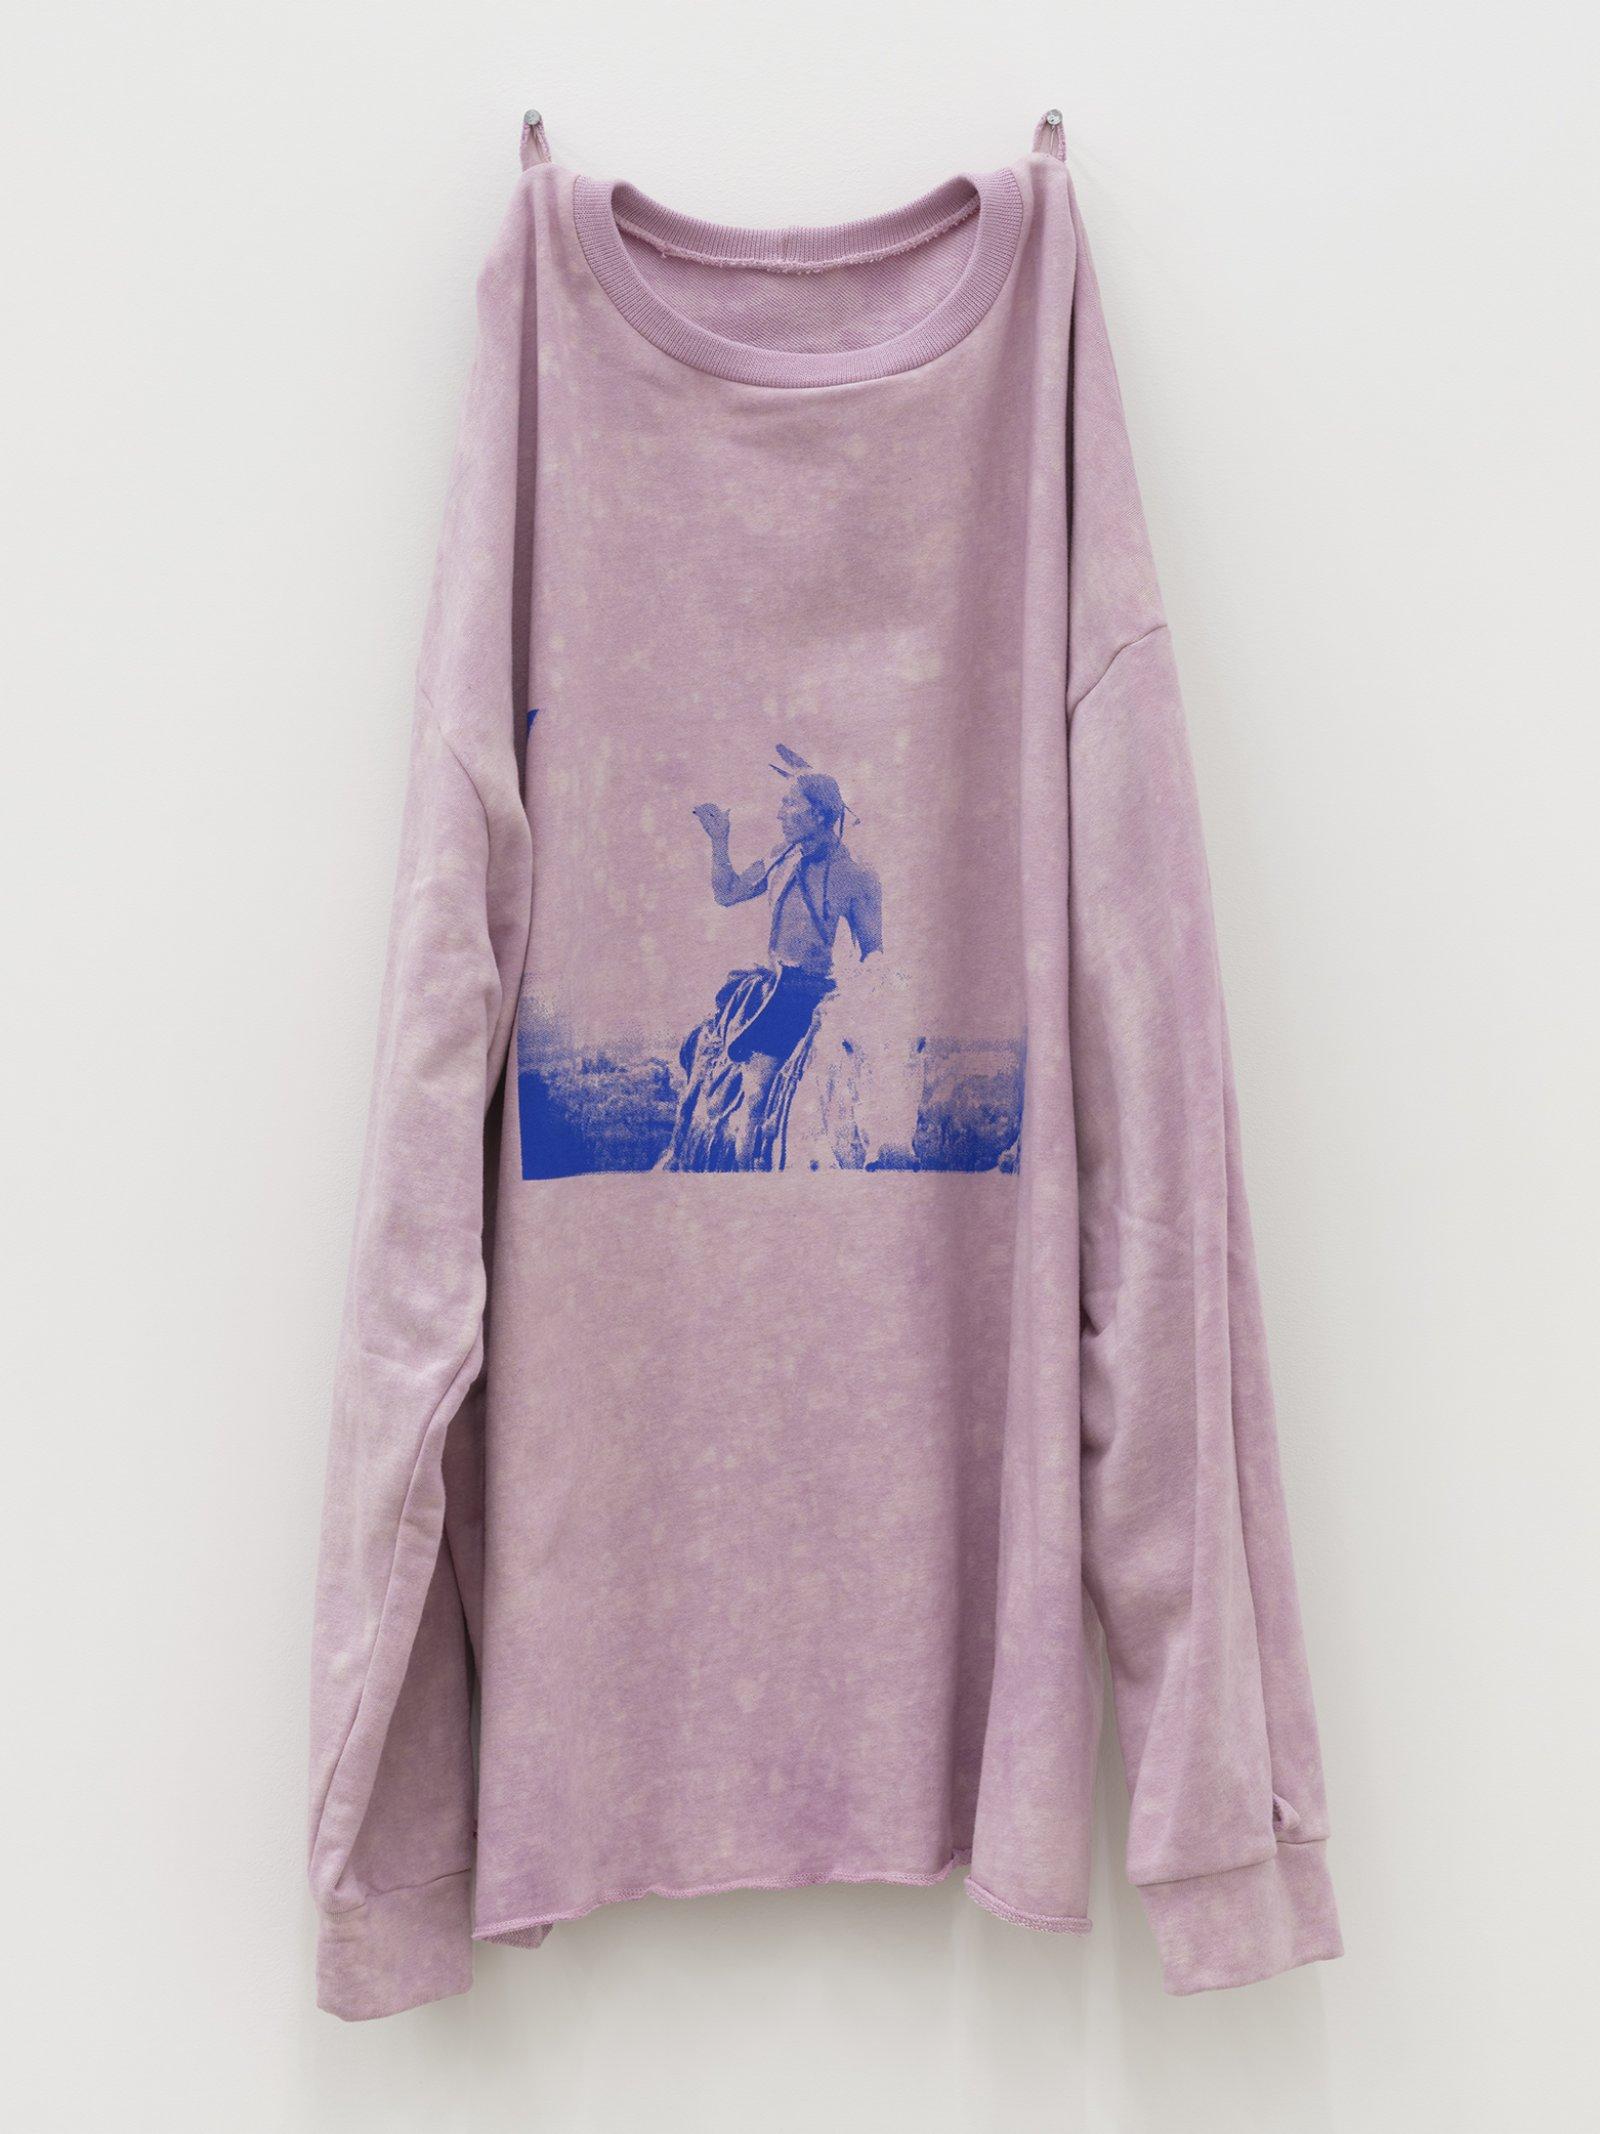 Duane Linklater, whiteeagle, 2020, handmade sweater, cochineal dye, silkscreen, nails, 38 x 20 x 5 in. (97 x 51 x 13 cm)